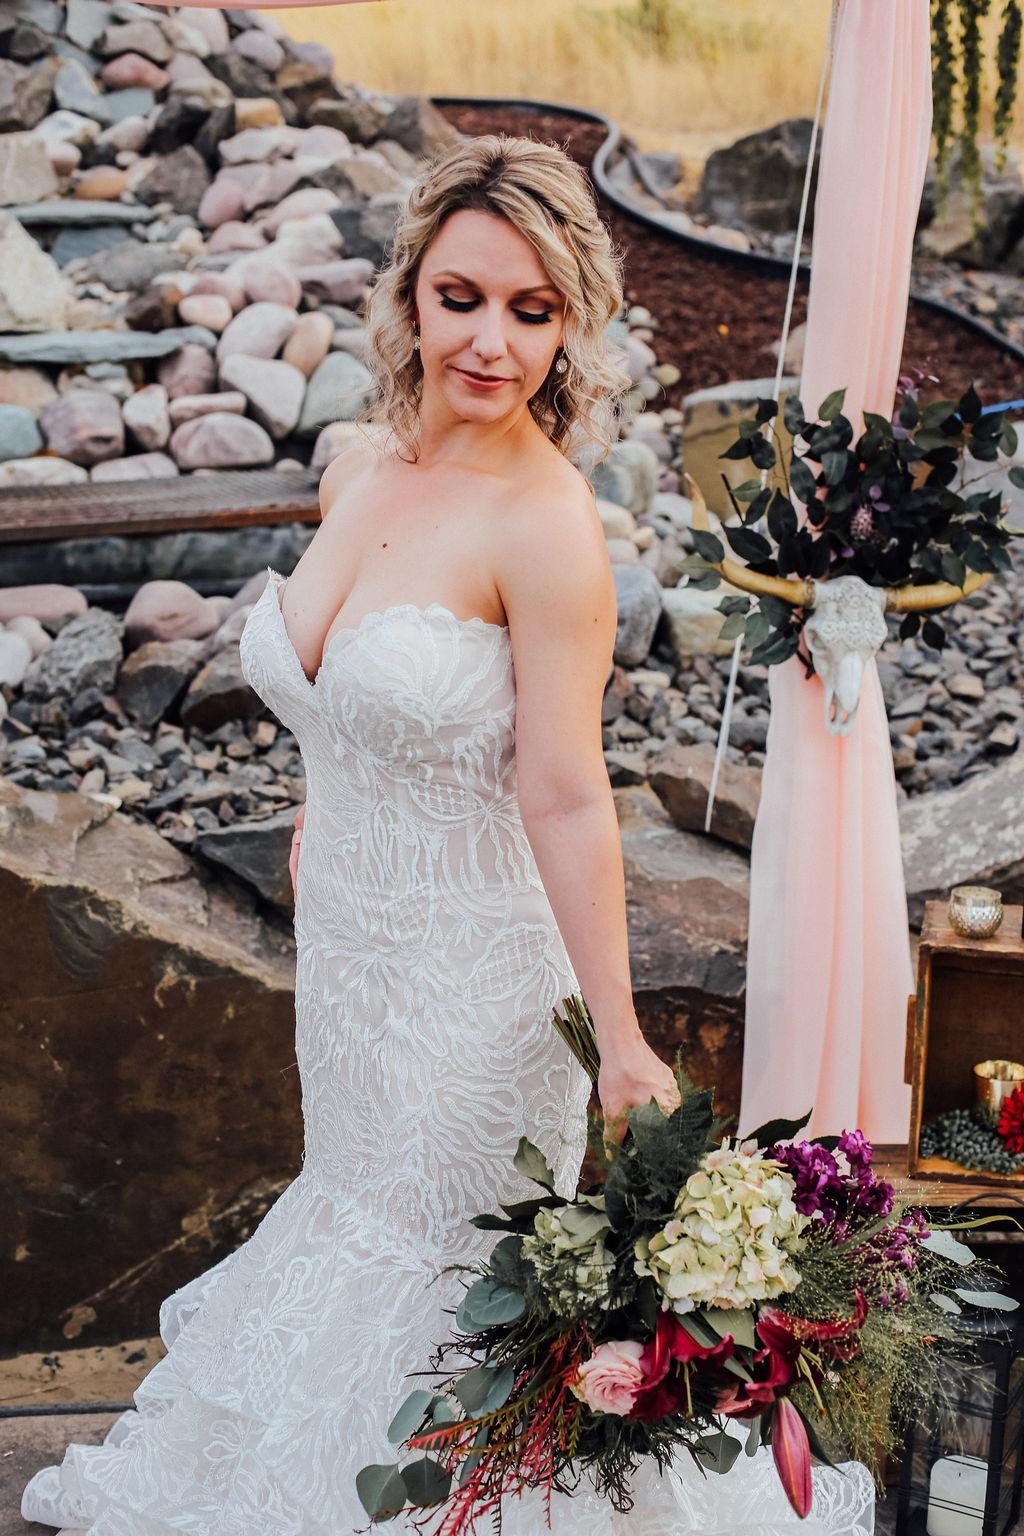 509 Bride_the 509 bride_purple pineapple photography_18